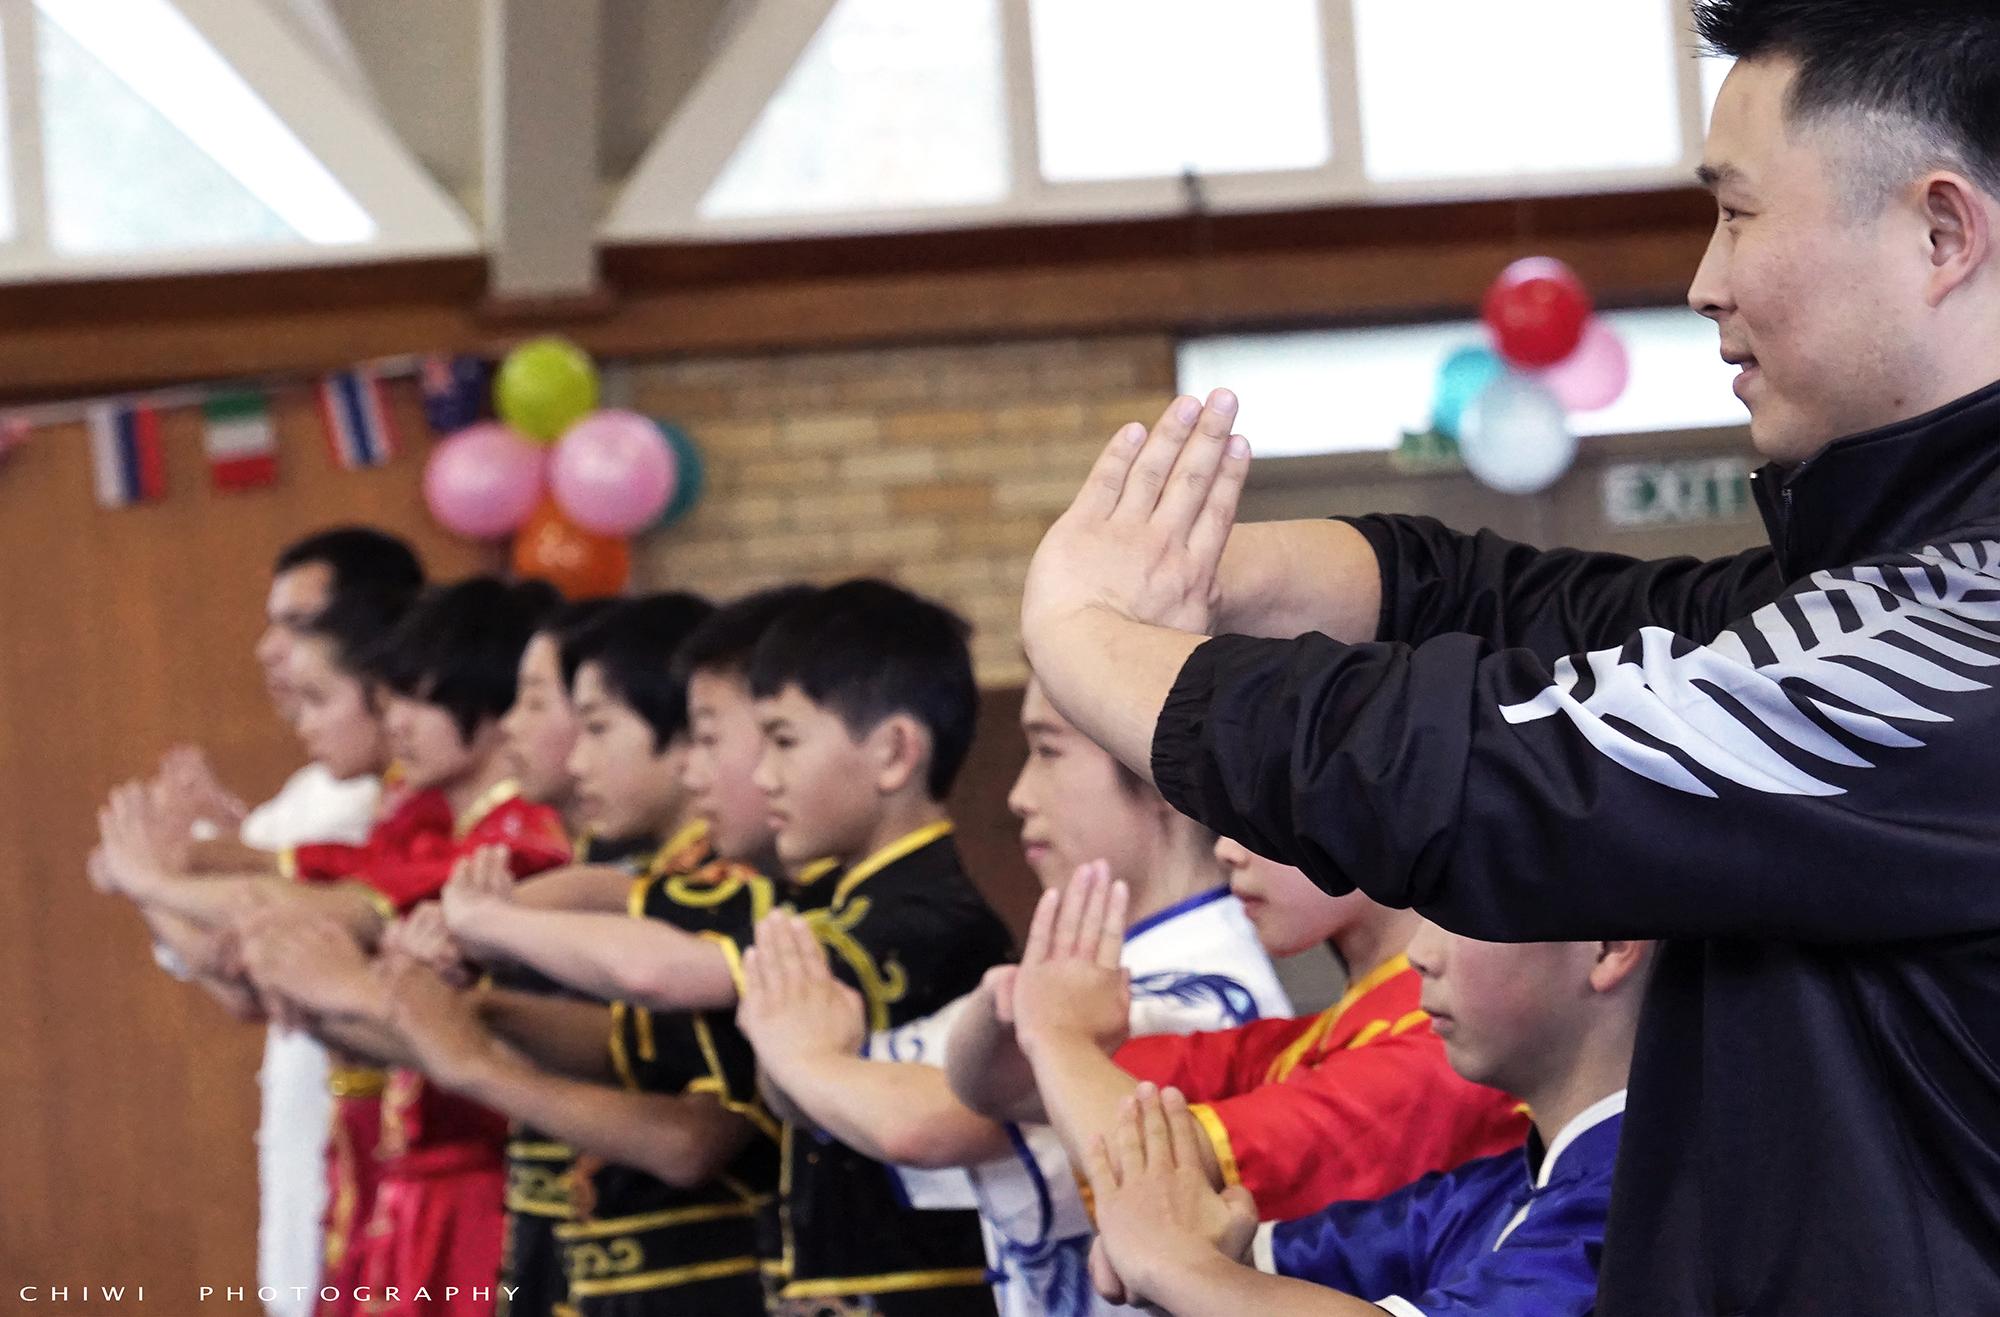 New Zealand Development Squad Group Salute